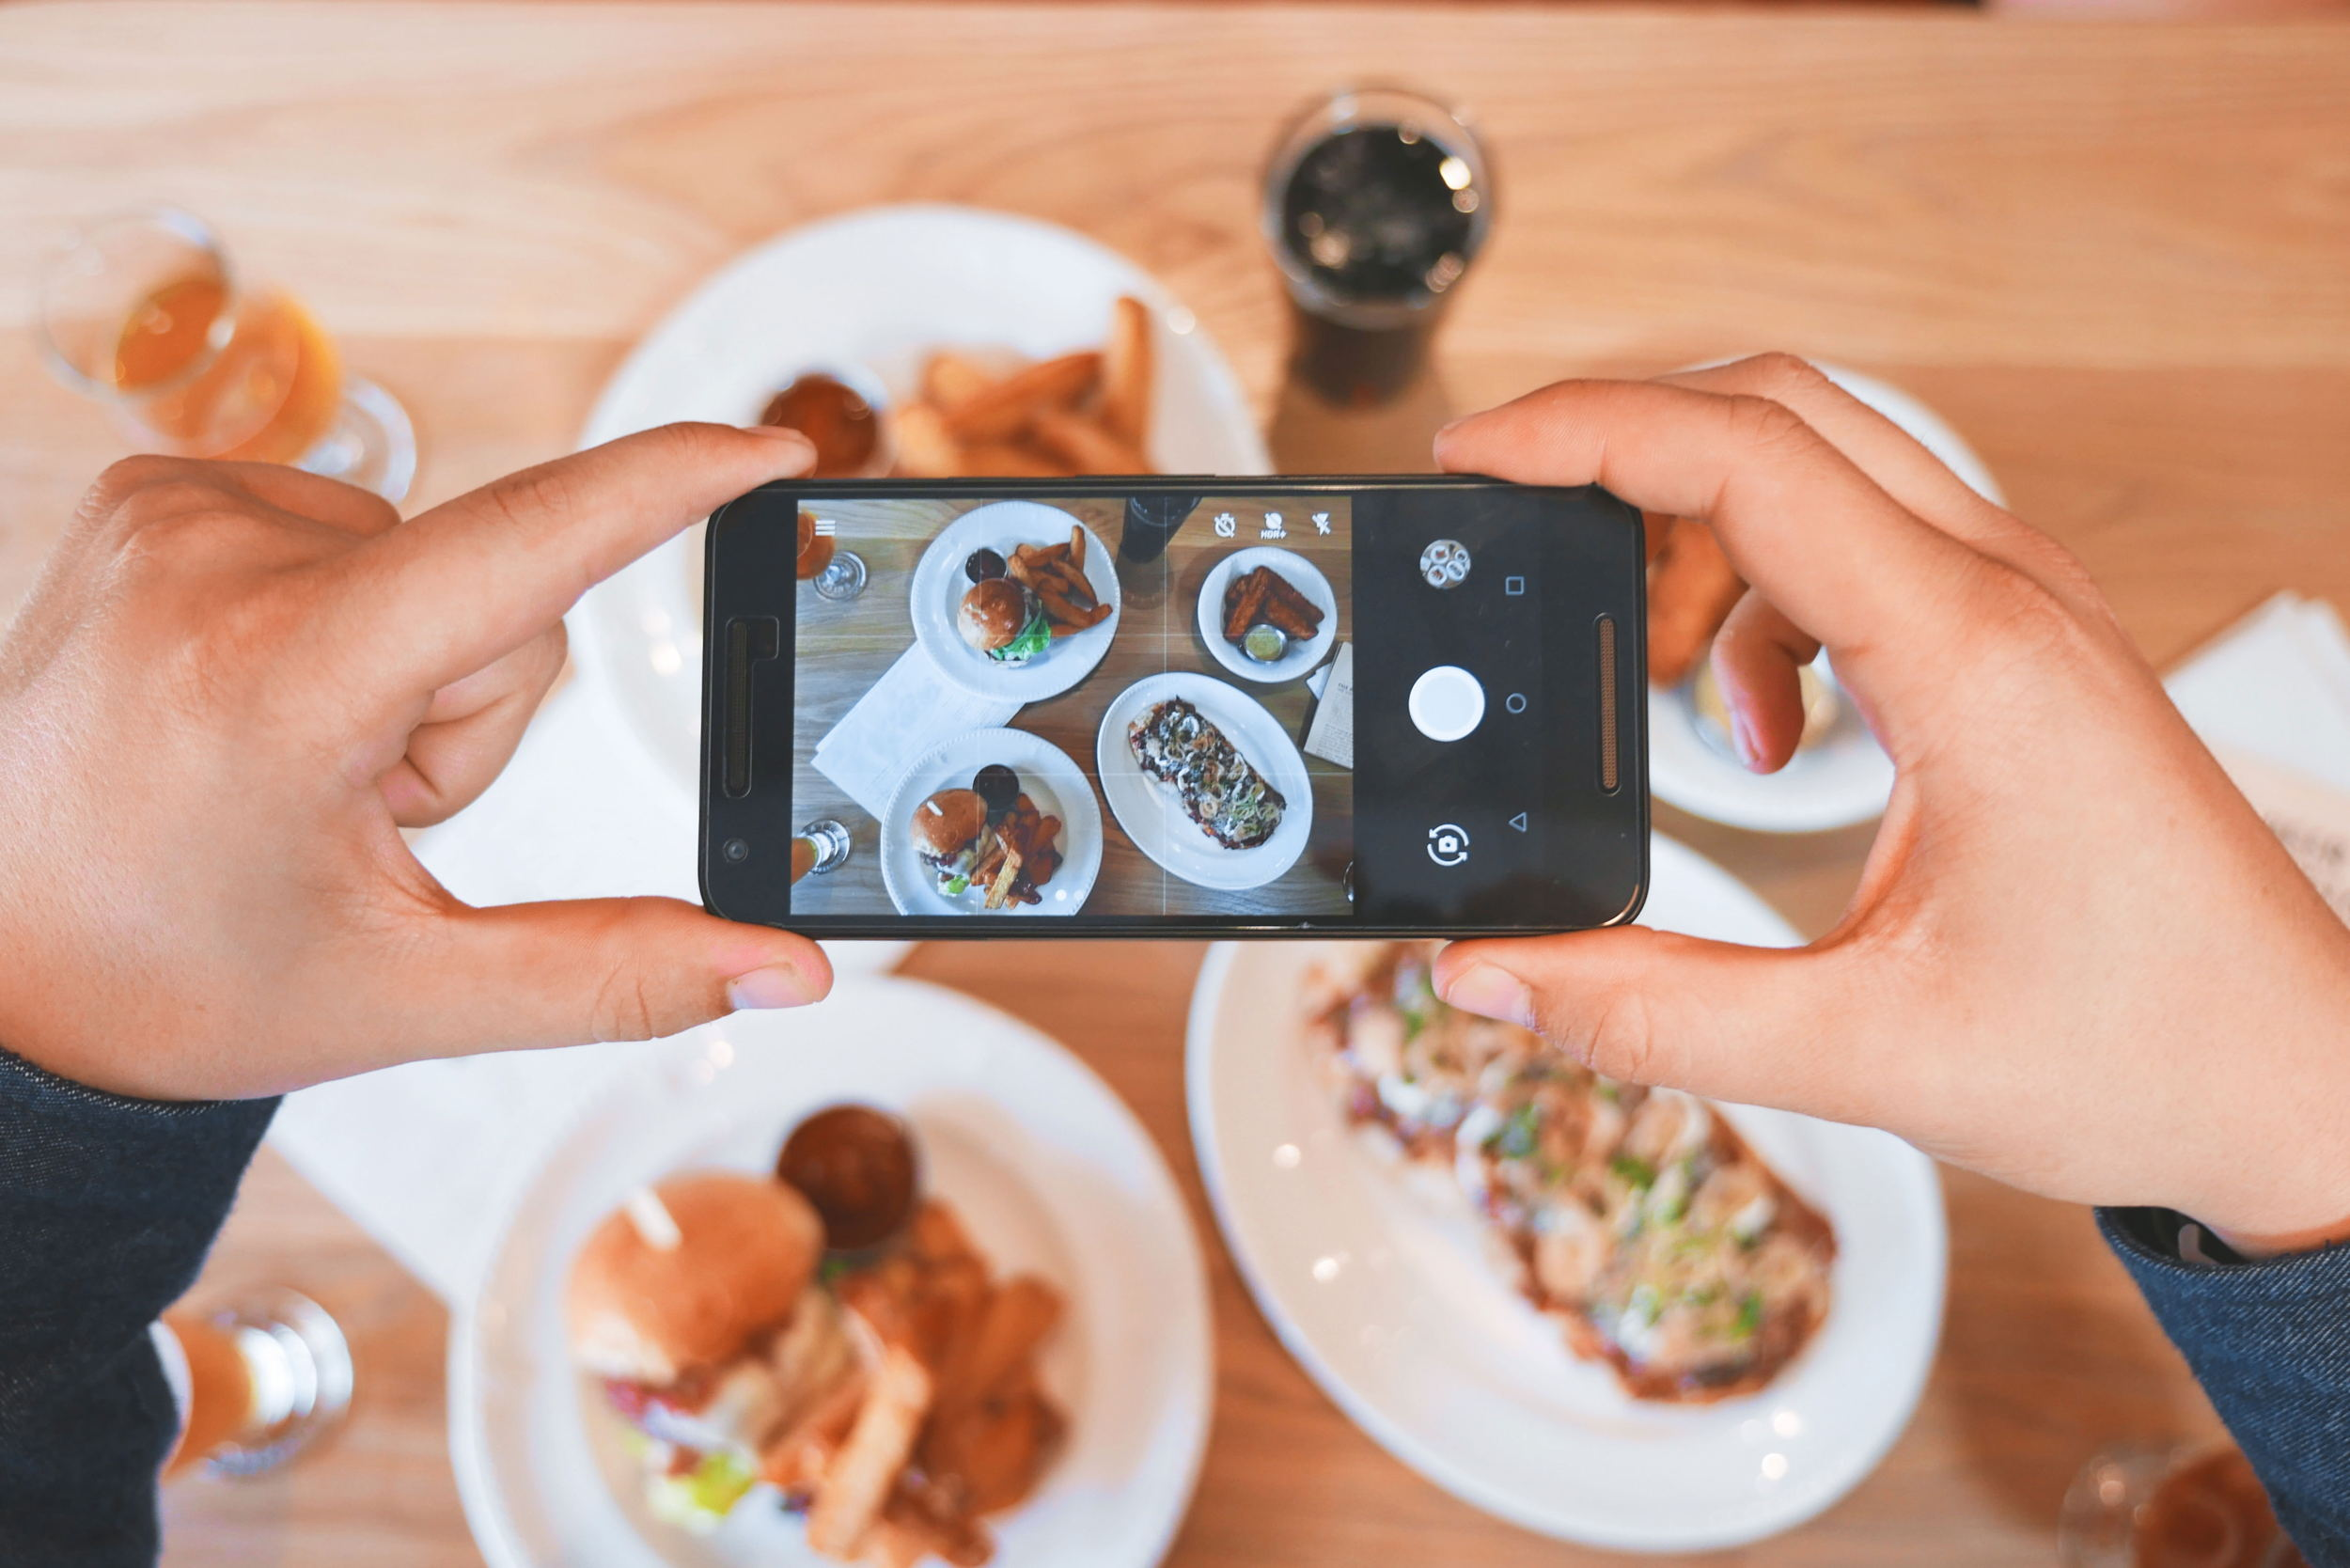 Squarespace and Social Media